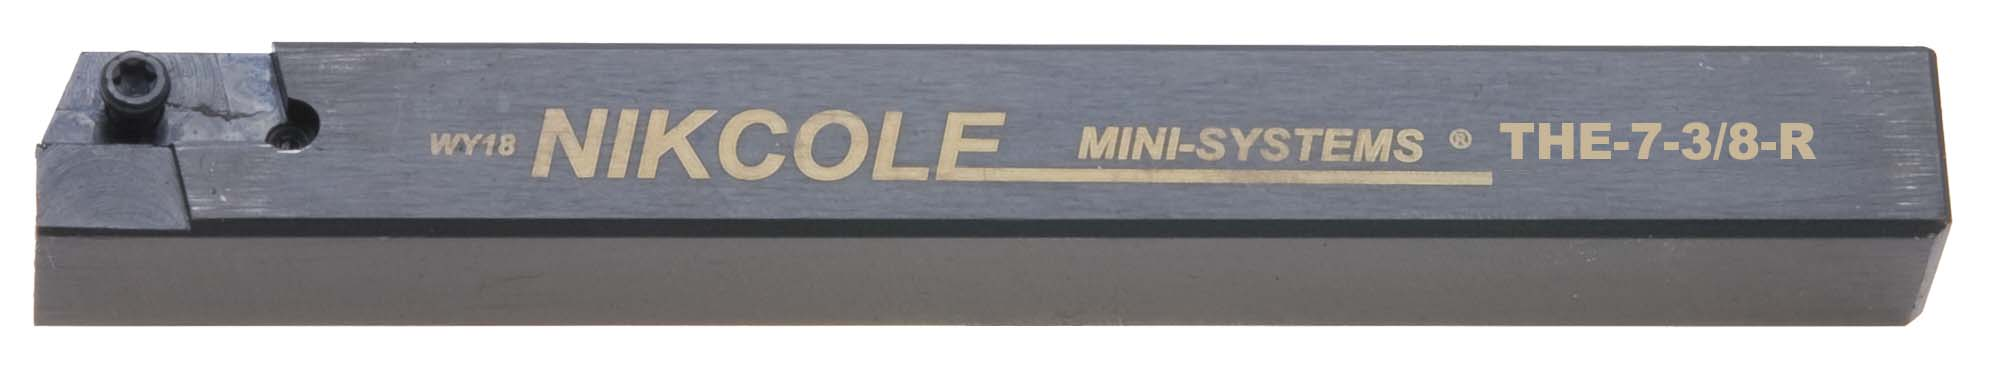 "Nikcole THE-7-3/8-R .375"" Sq. RH Mini-System Tool Holder"